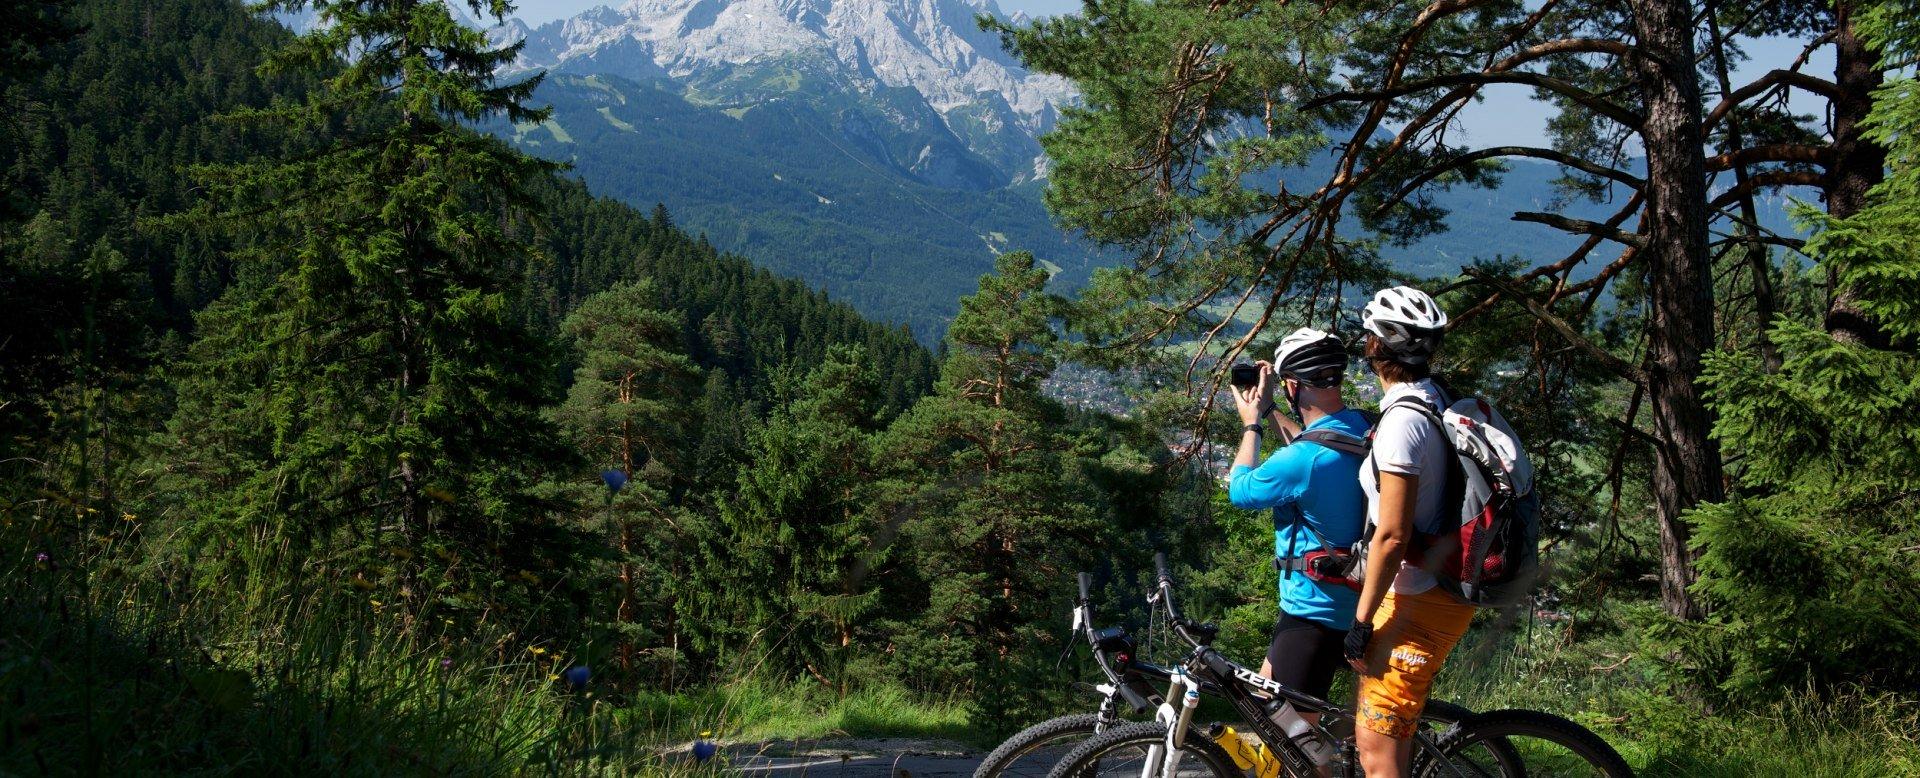 Mountainbiken in Grainau, © Zugspitzland